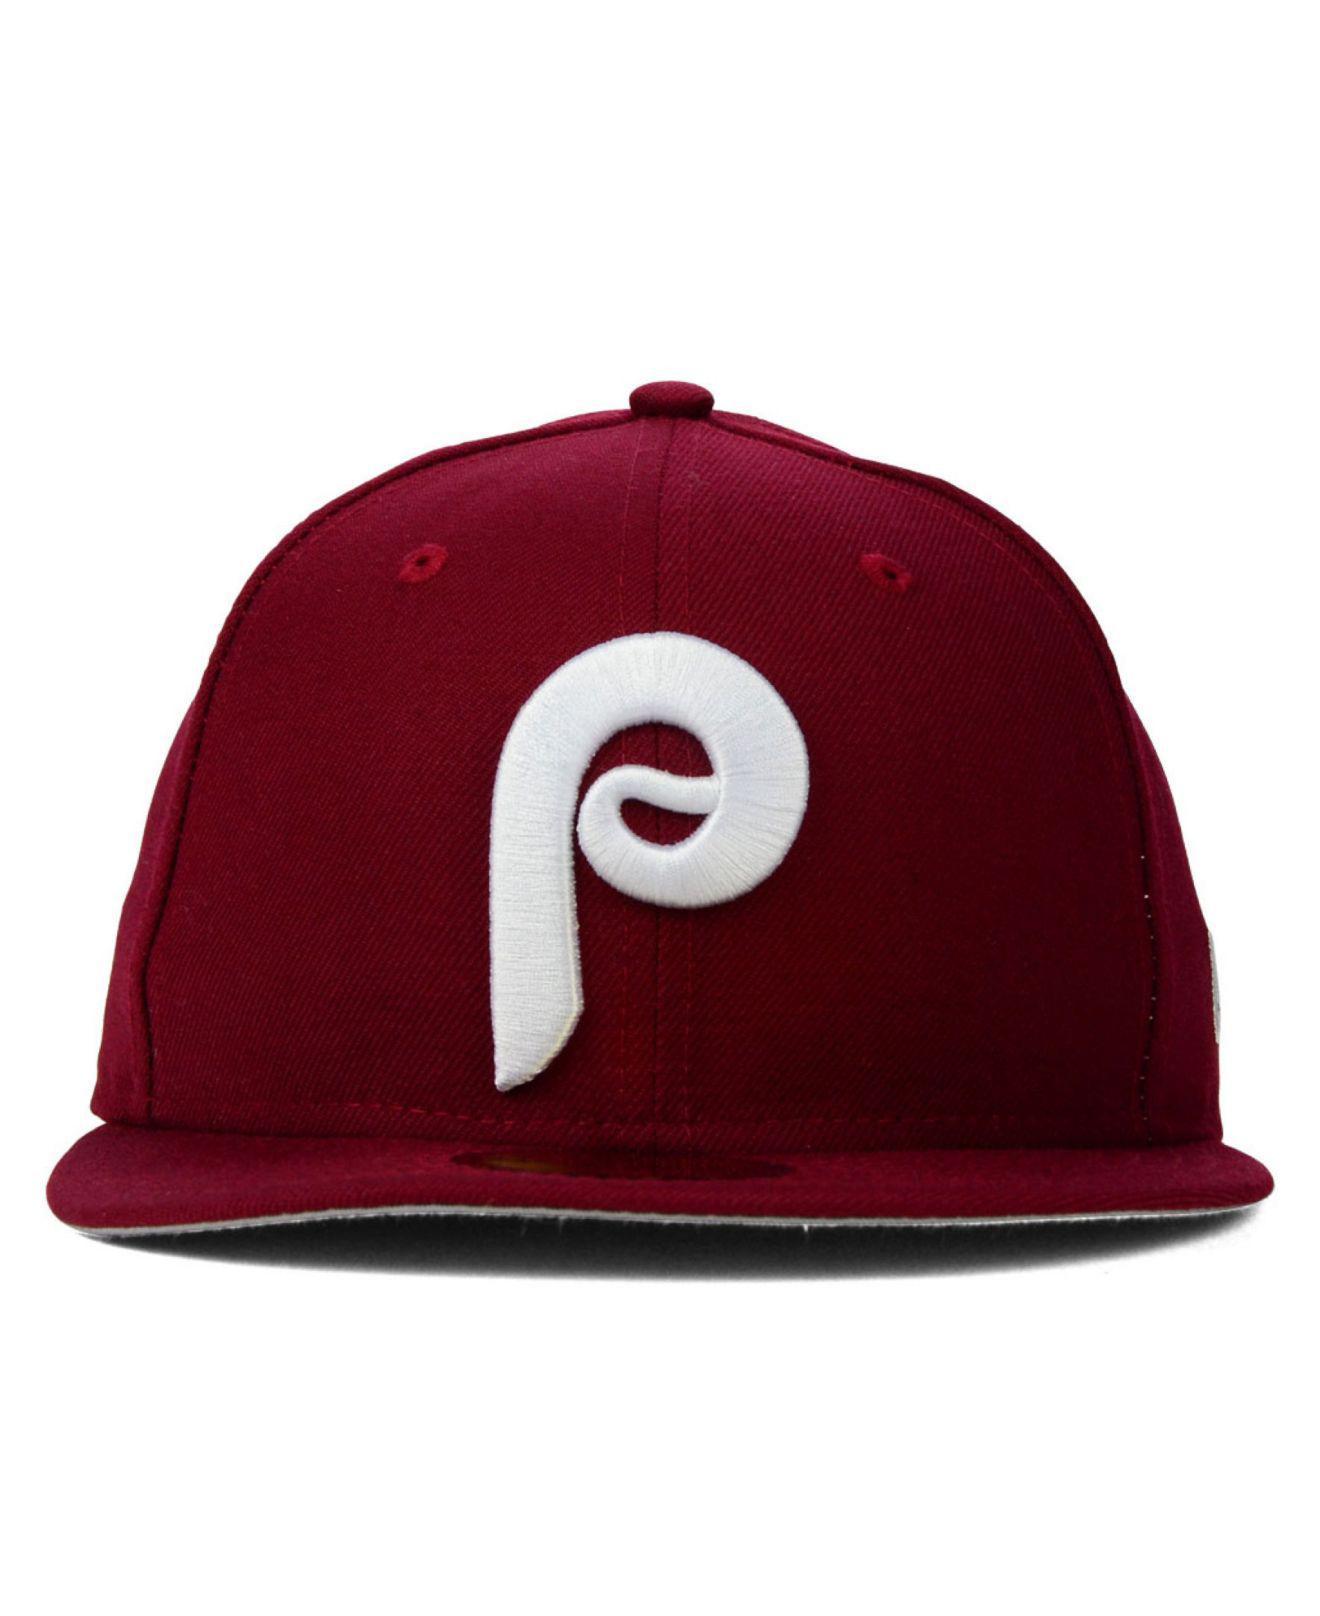 0f8724ee73d Lyst - KTZ Philadelphia Phillies Mlb Cooperstown 59fifty Cap in Red for Men  - Save 5%